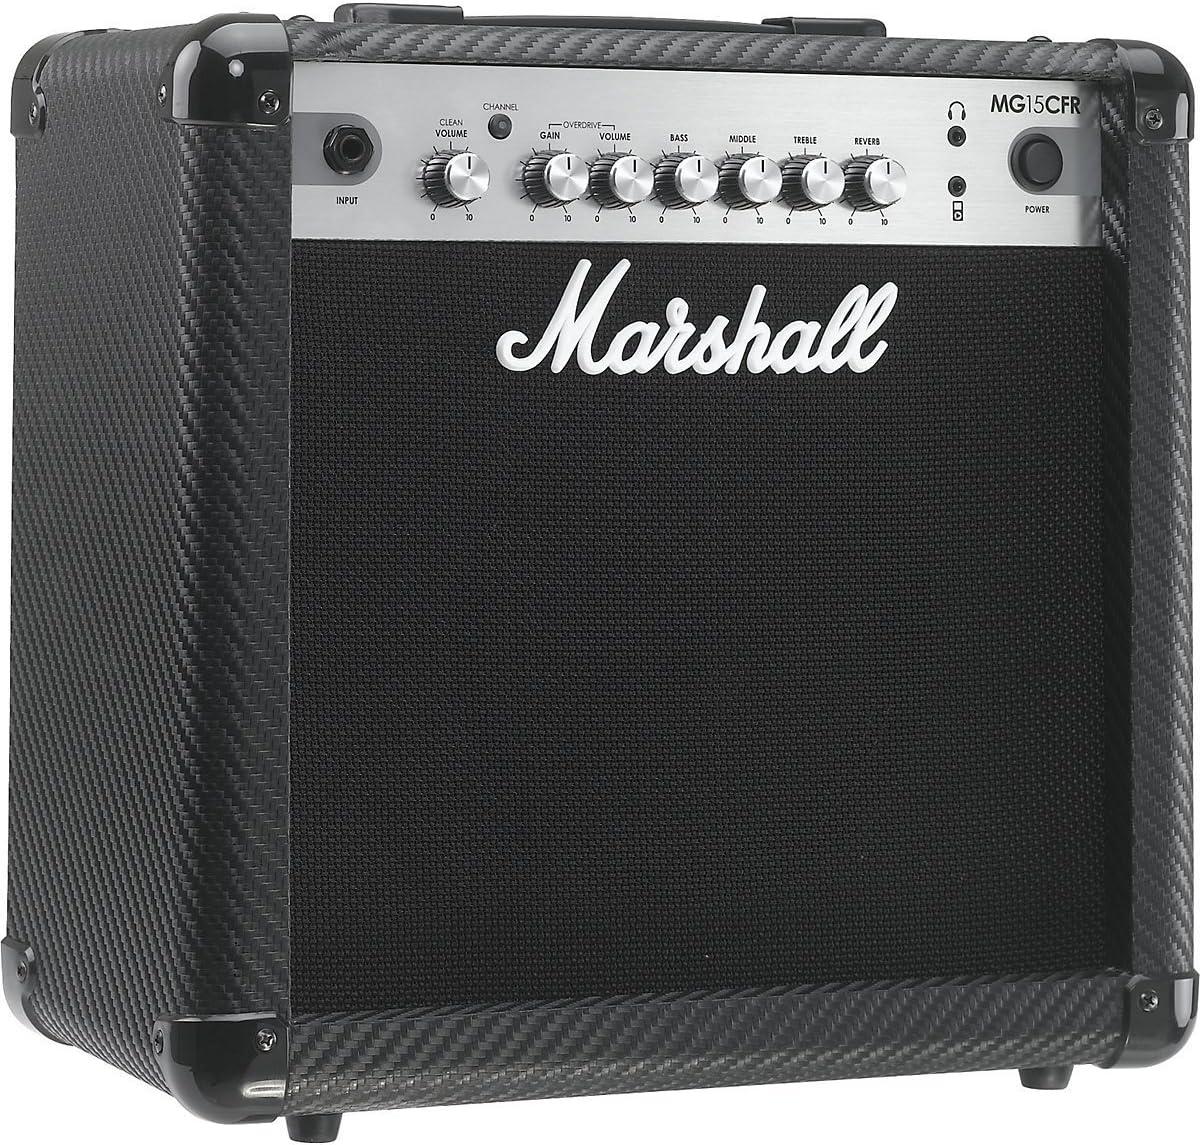 Marshall MG15CFR - Amplificador combo 15 w reverb mma: Amazon.es ...